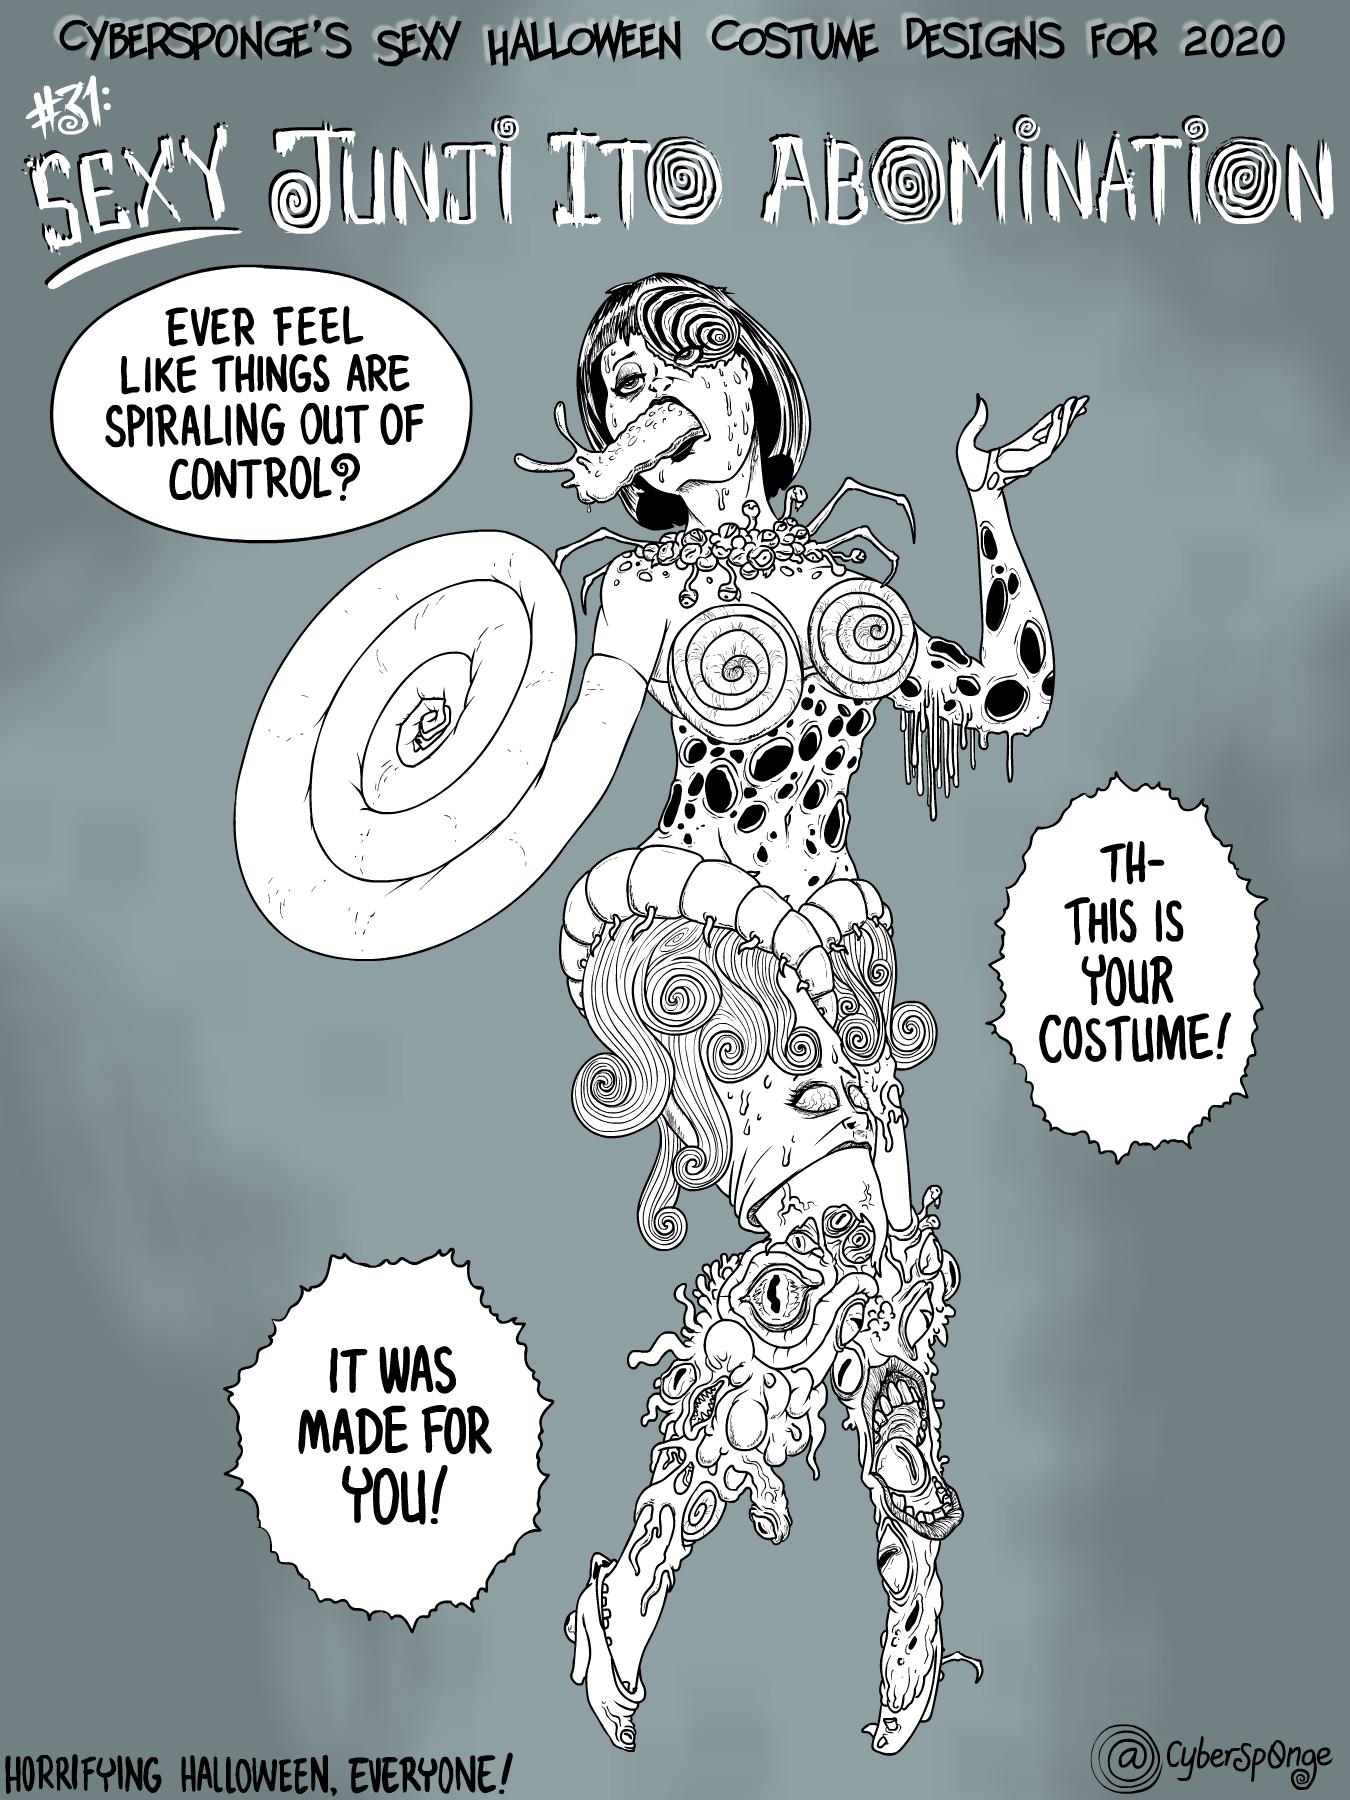 Sexy Junji Ito Abomination Costume